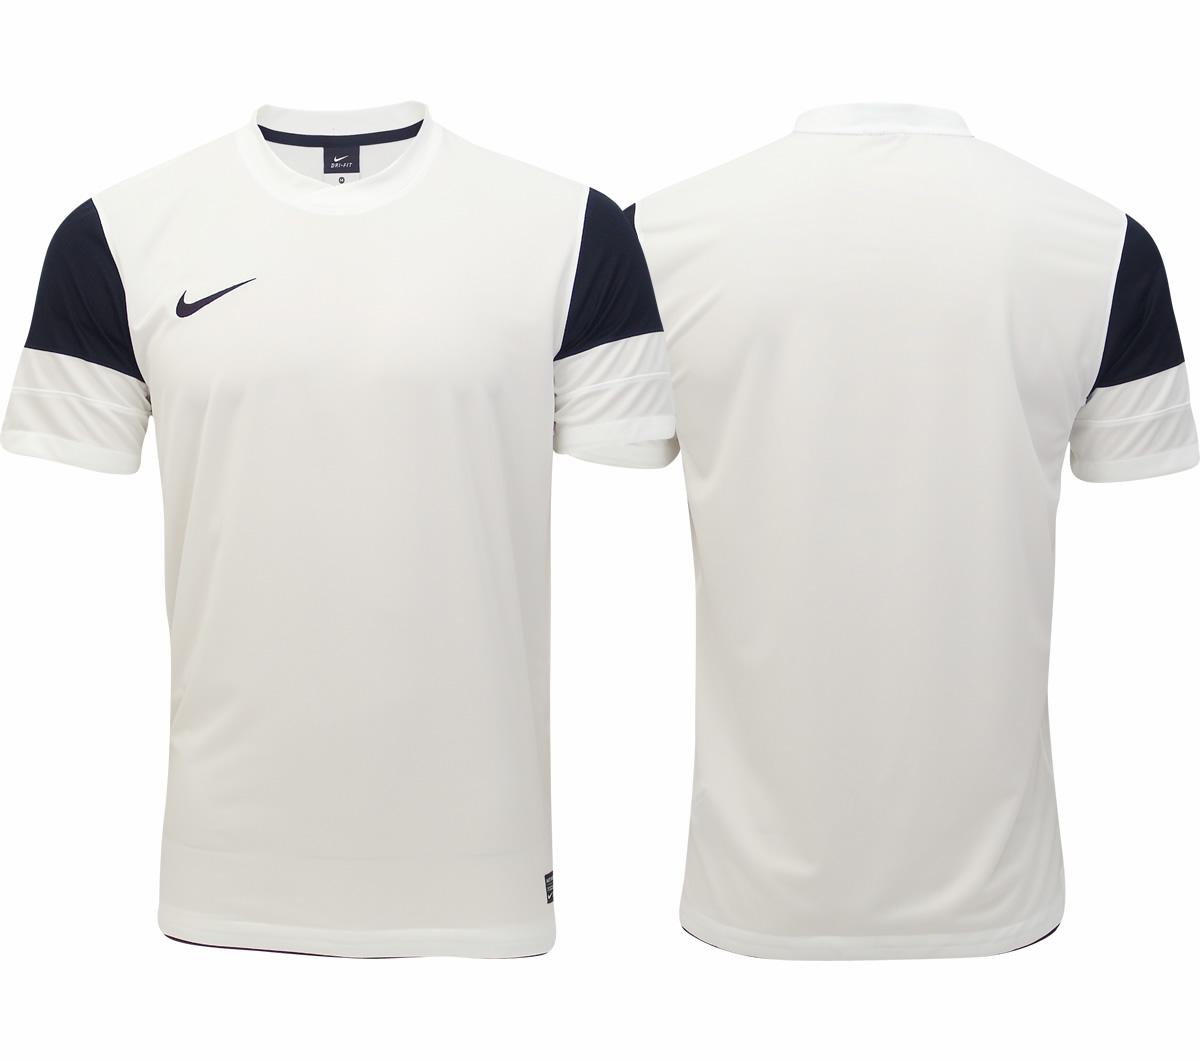 Camisa Nike Trophy Branca e Preta Camisa Nike Trophy Branca e Preta 453a401e2e122